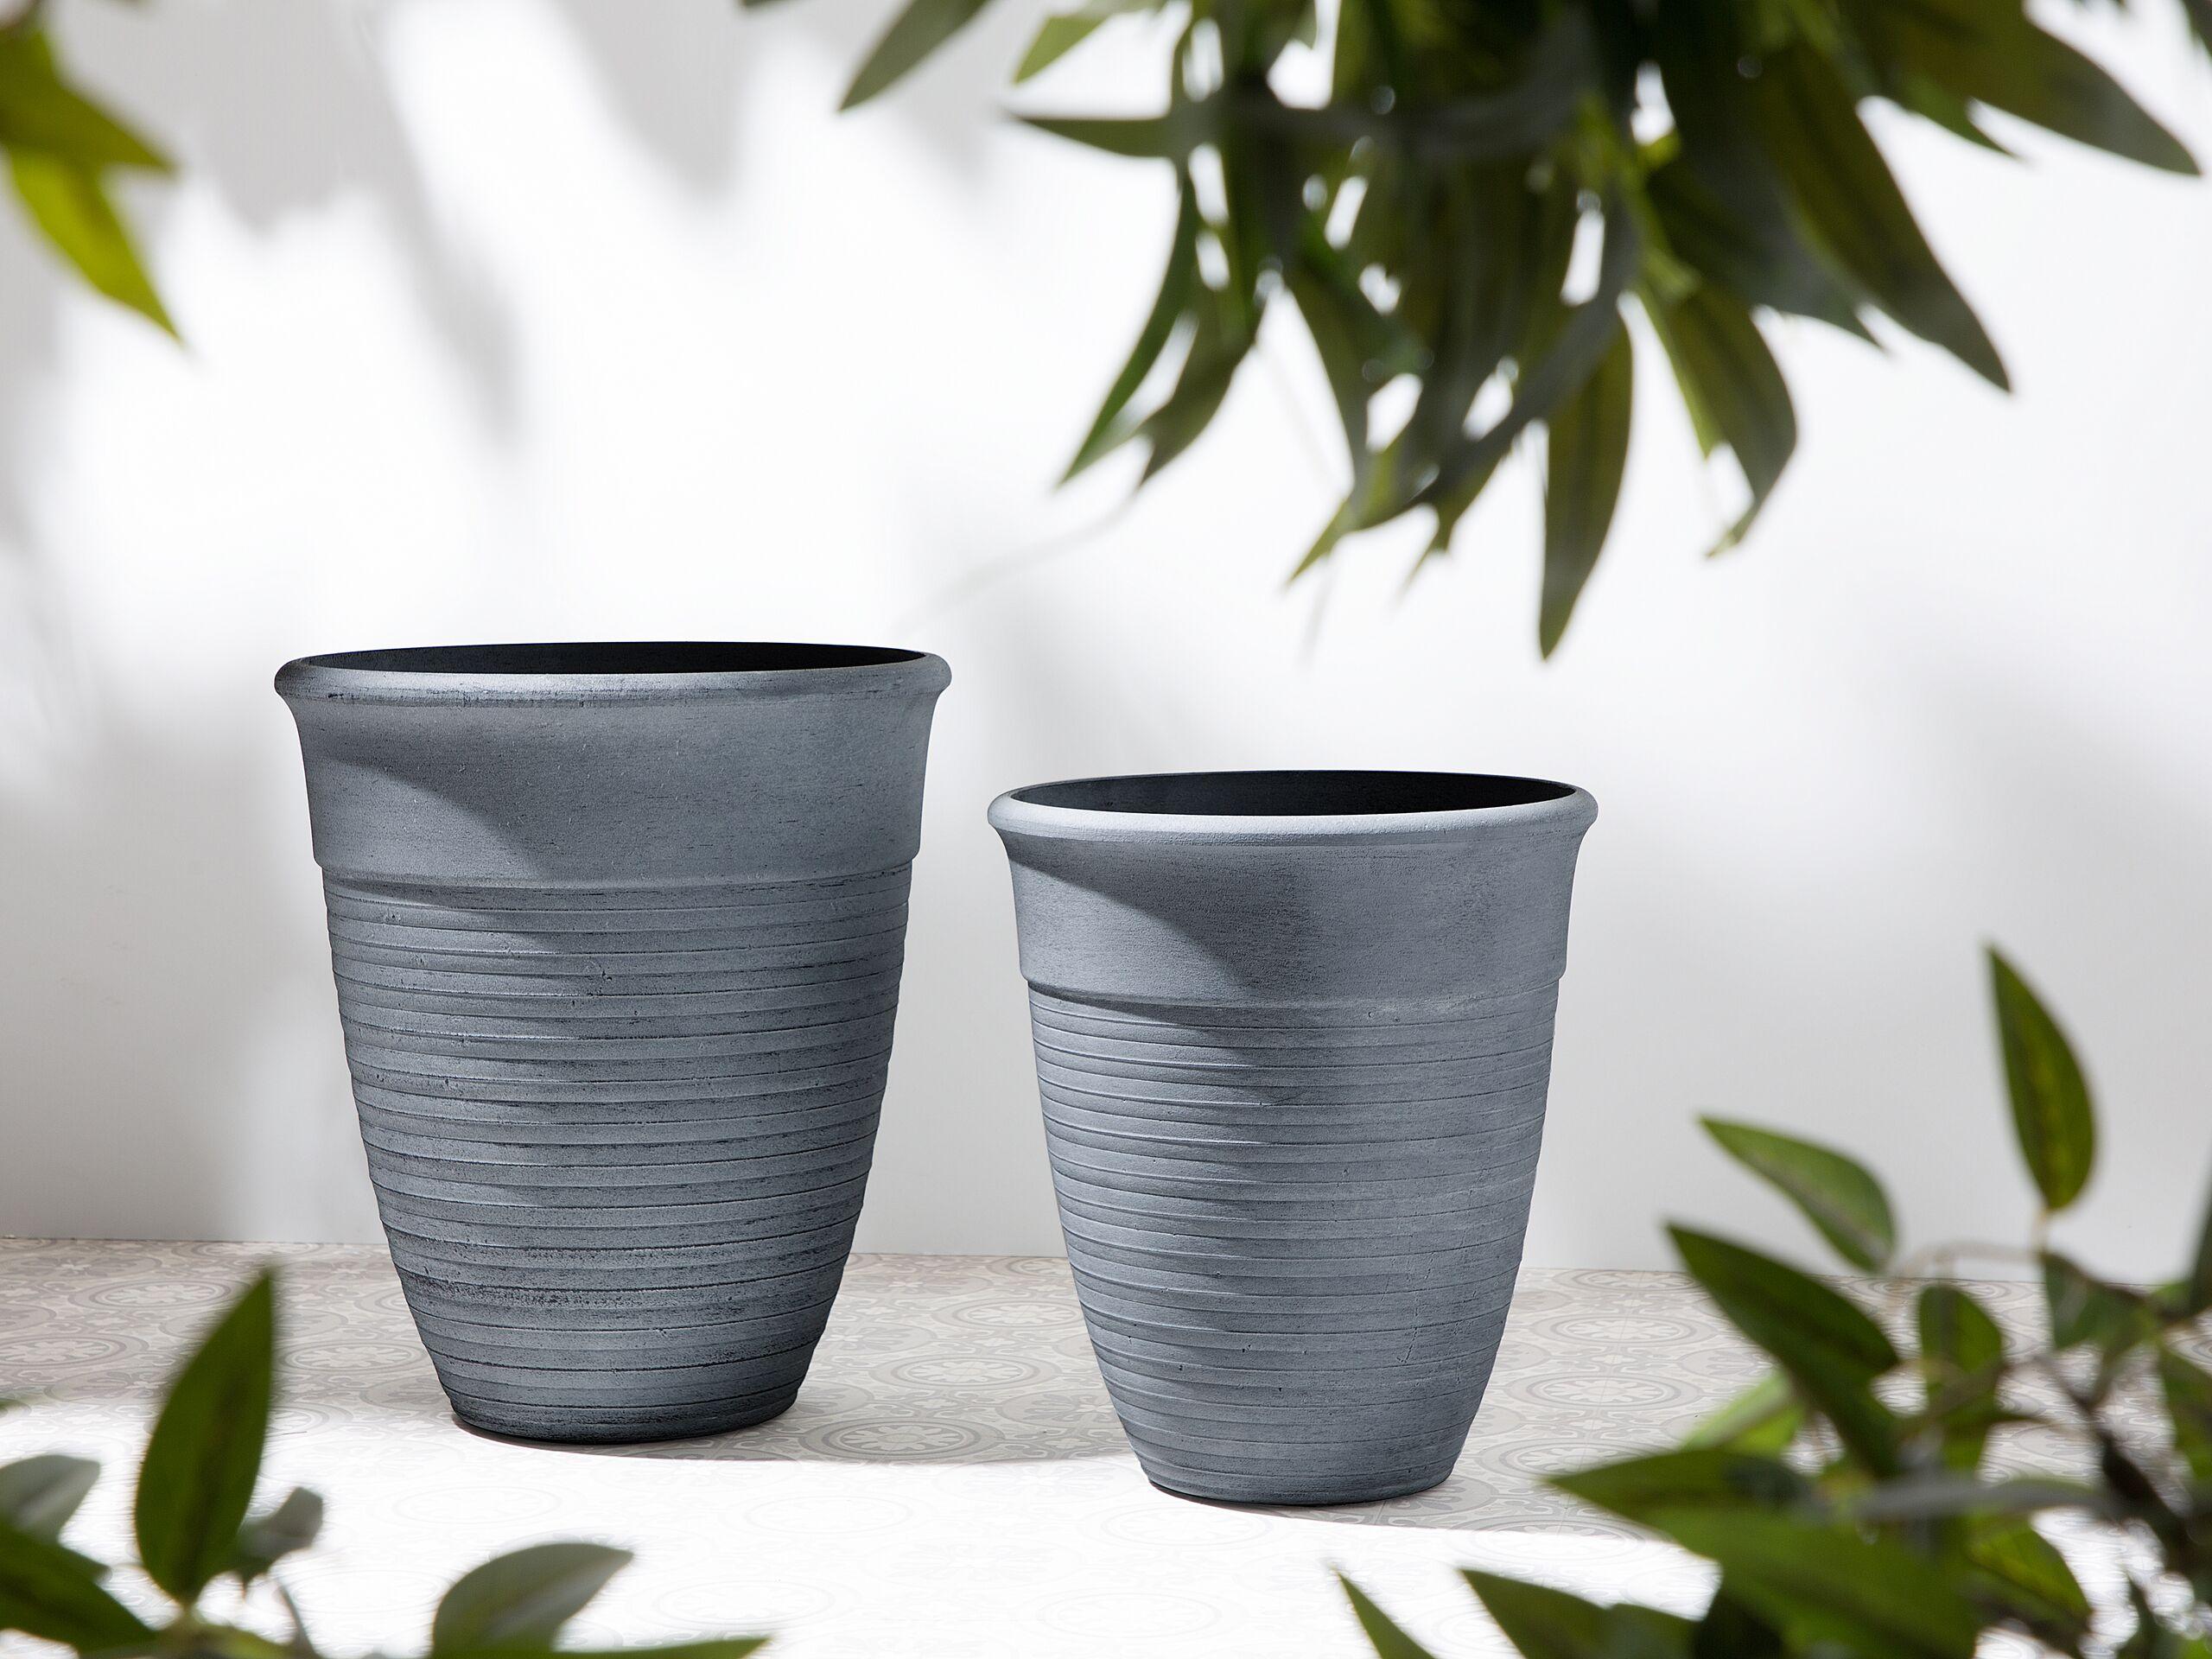 beliani set di 2 vasi rotondi miscela di pietre colore grigio varie dimensioni